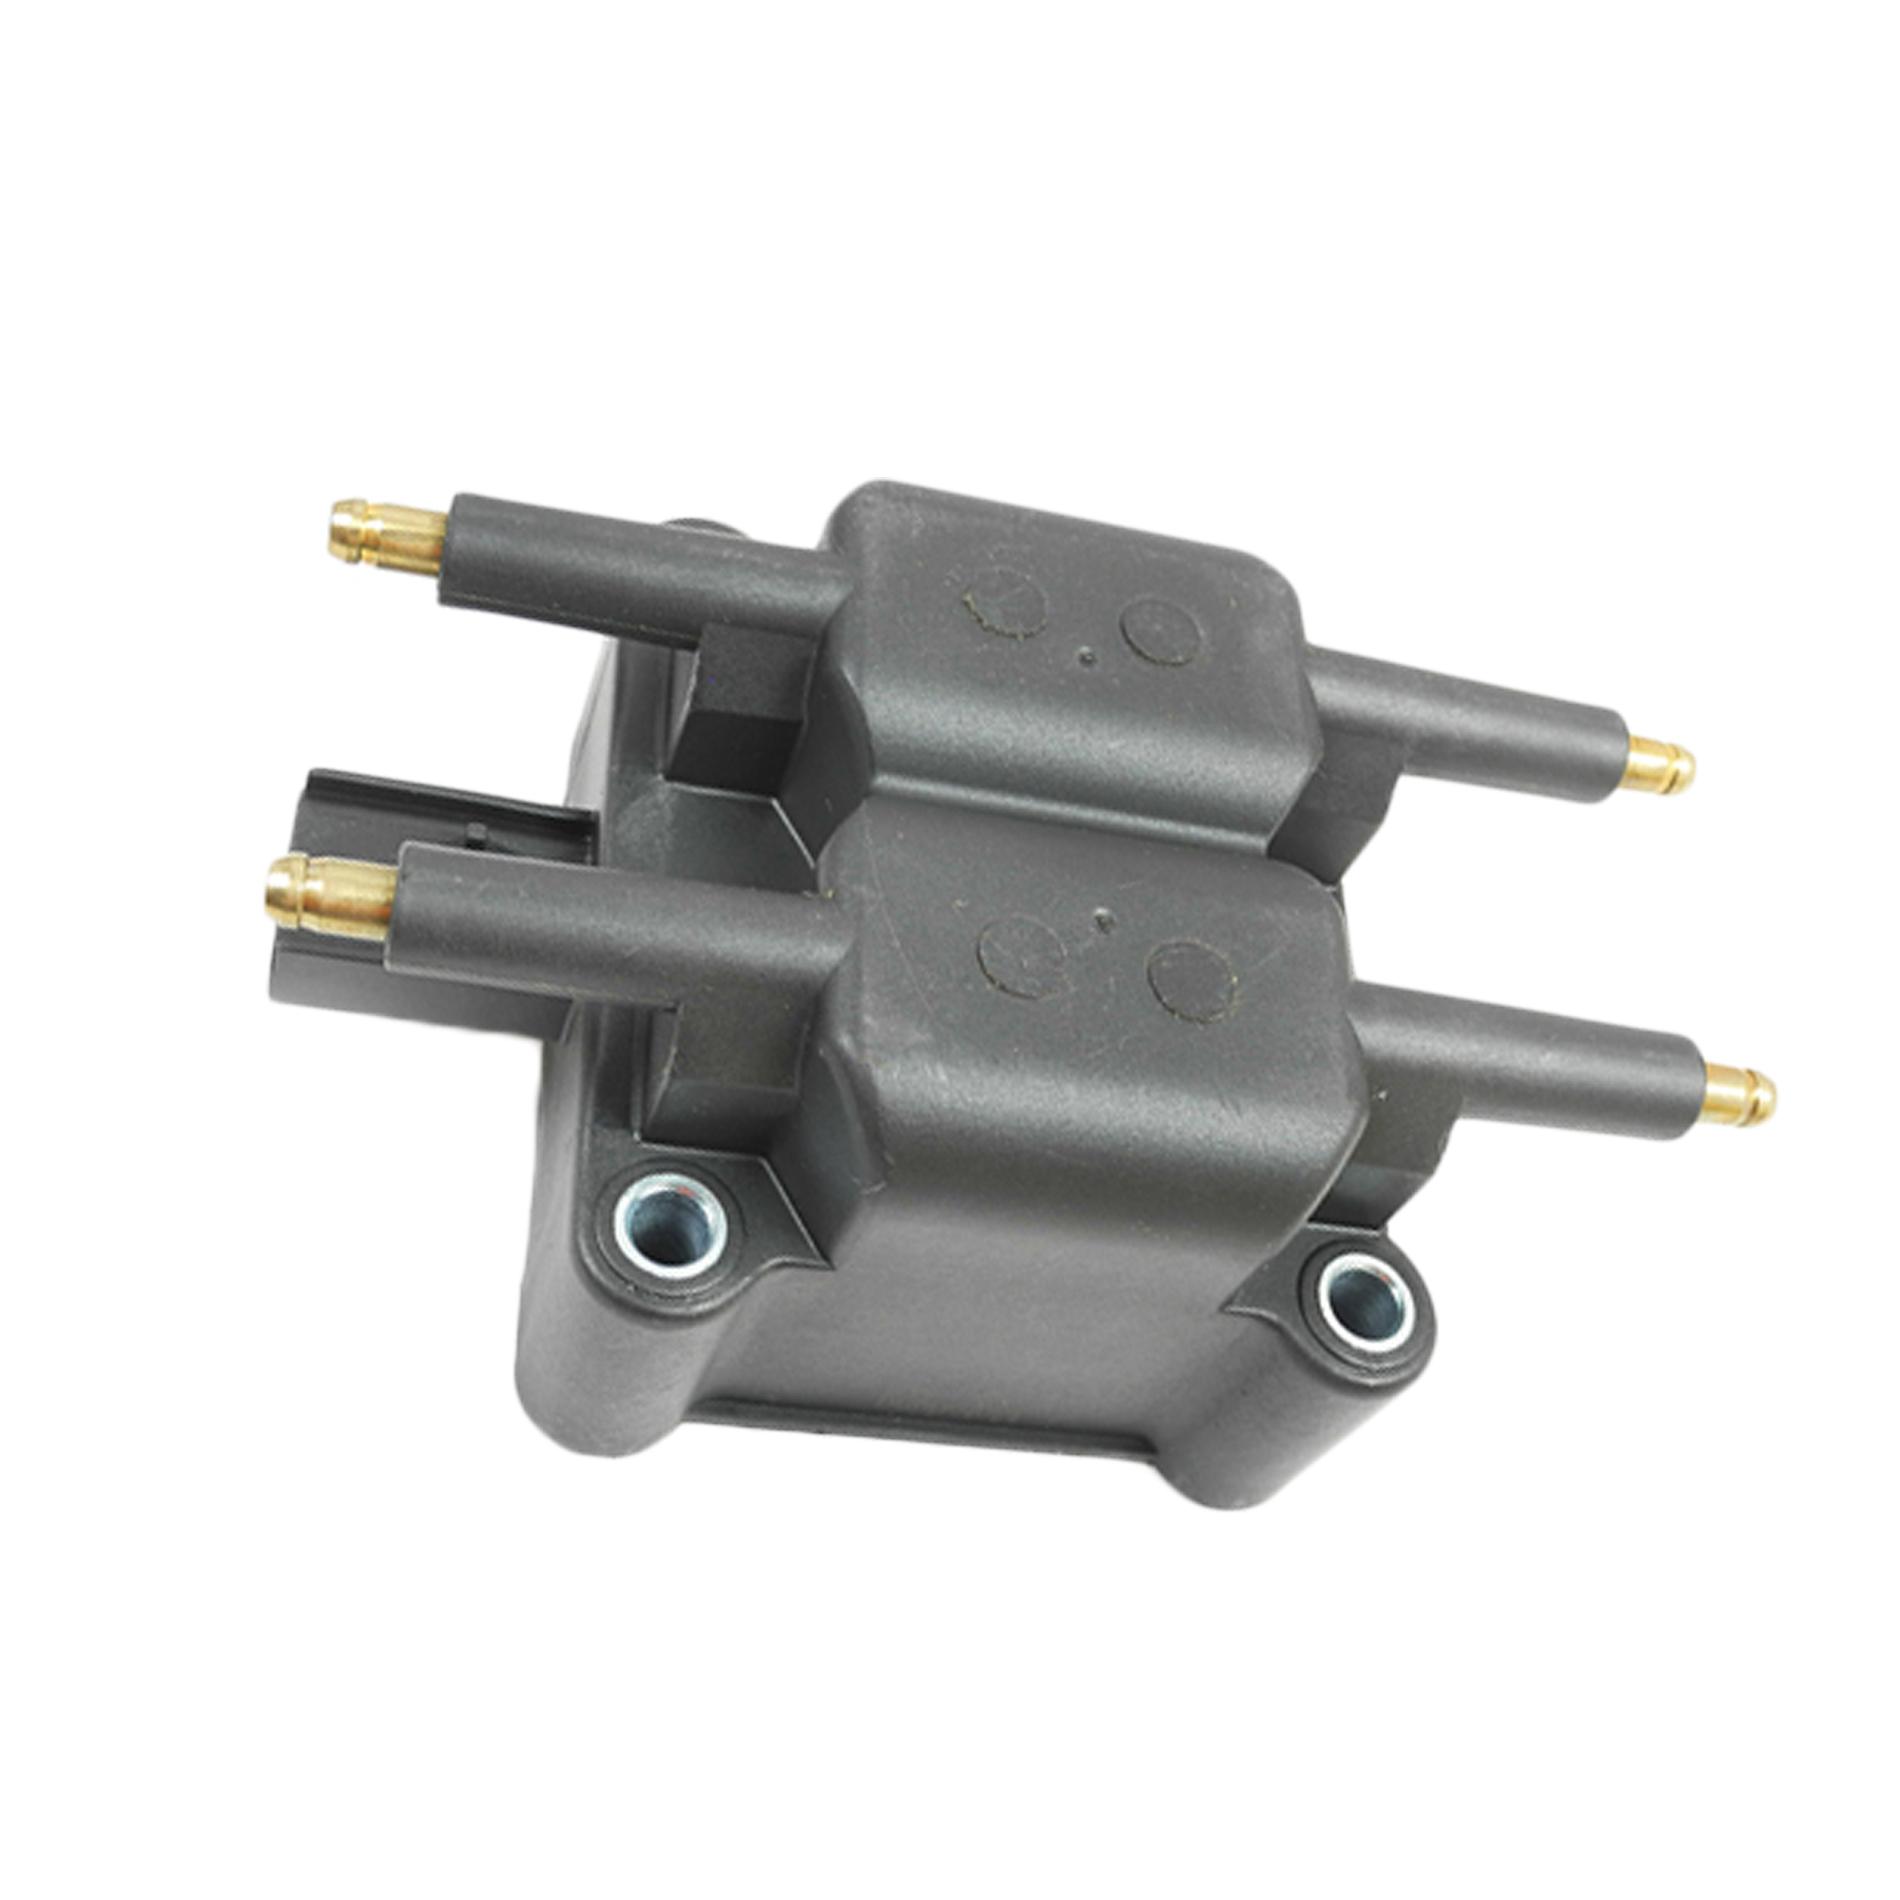 New Ignition Coil For 95-10 Chrysler Dodge Plymouth TJ L4 V10 UF183 UF189 UF403